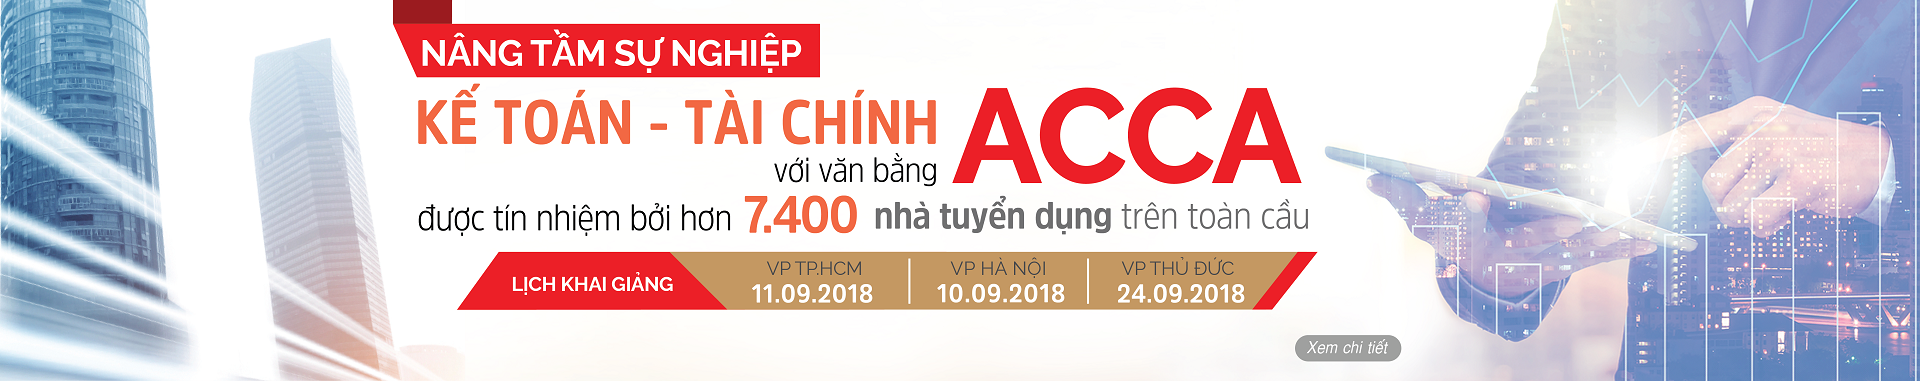 4 banner-website-acca-01